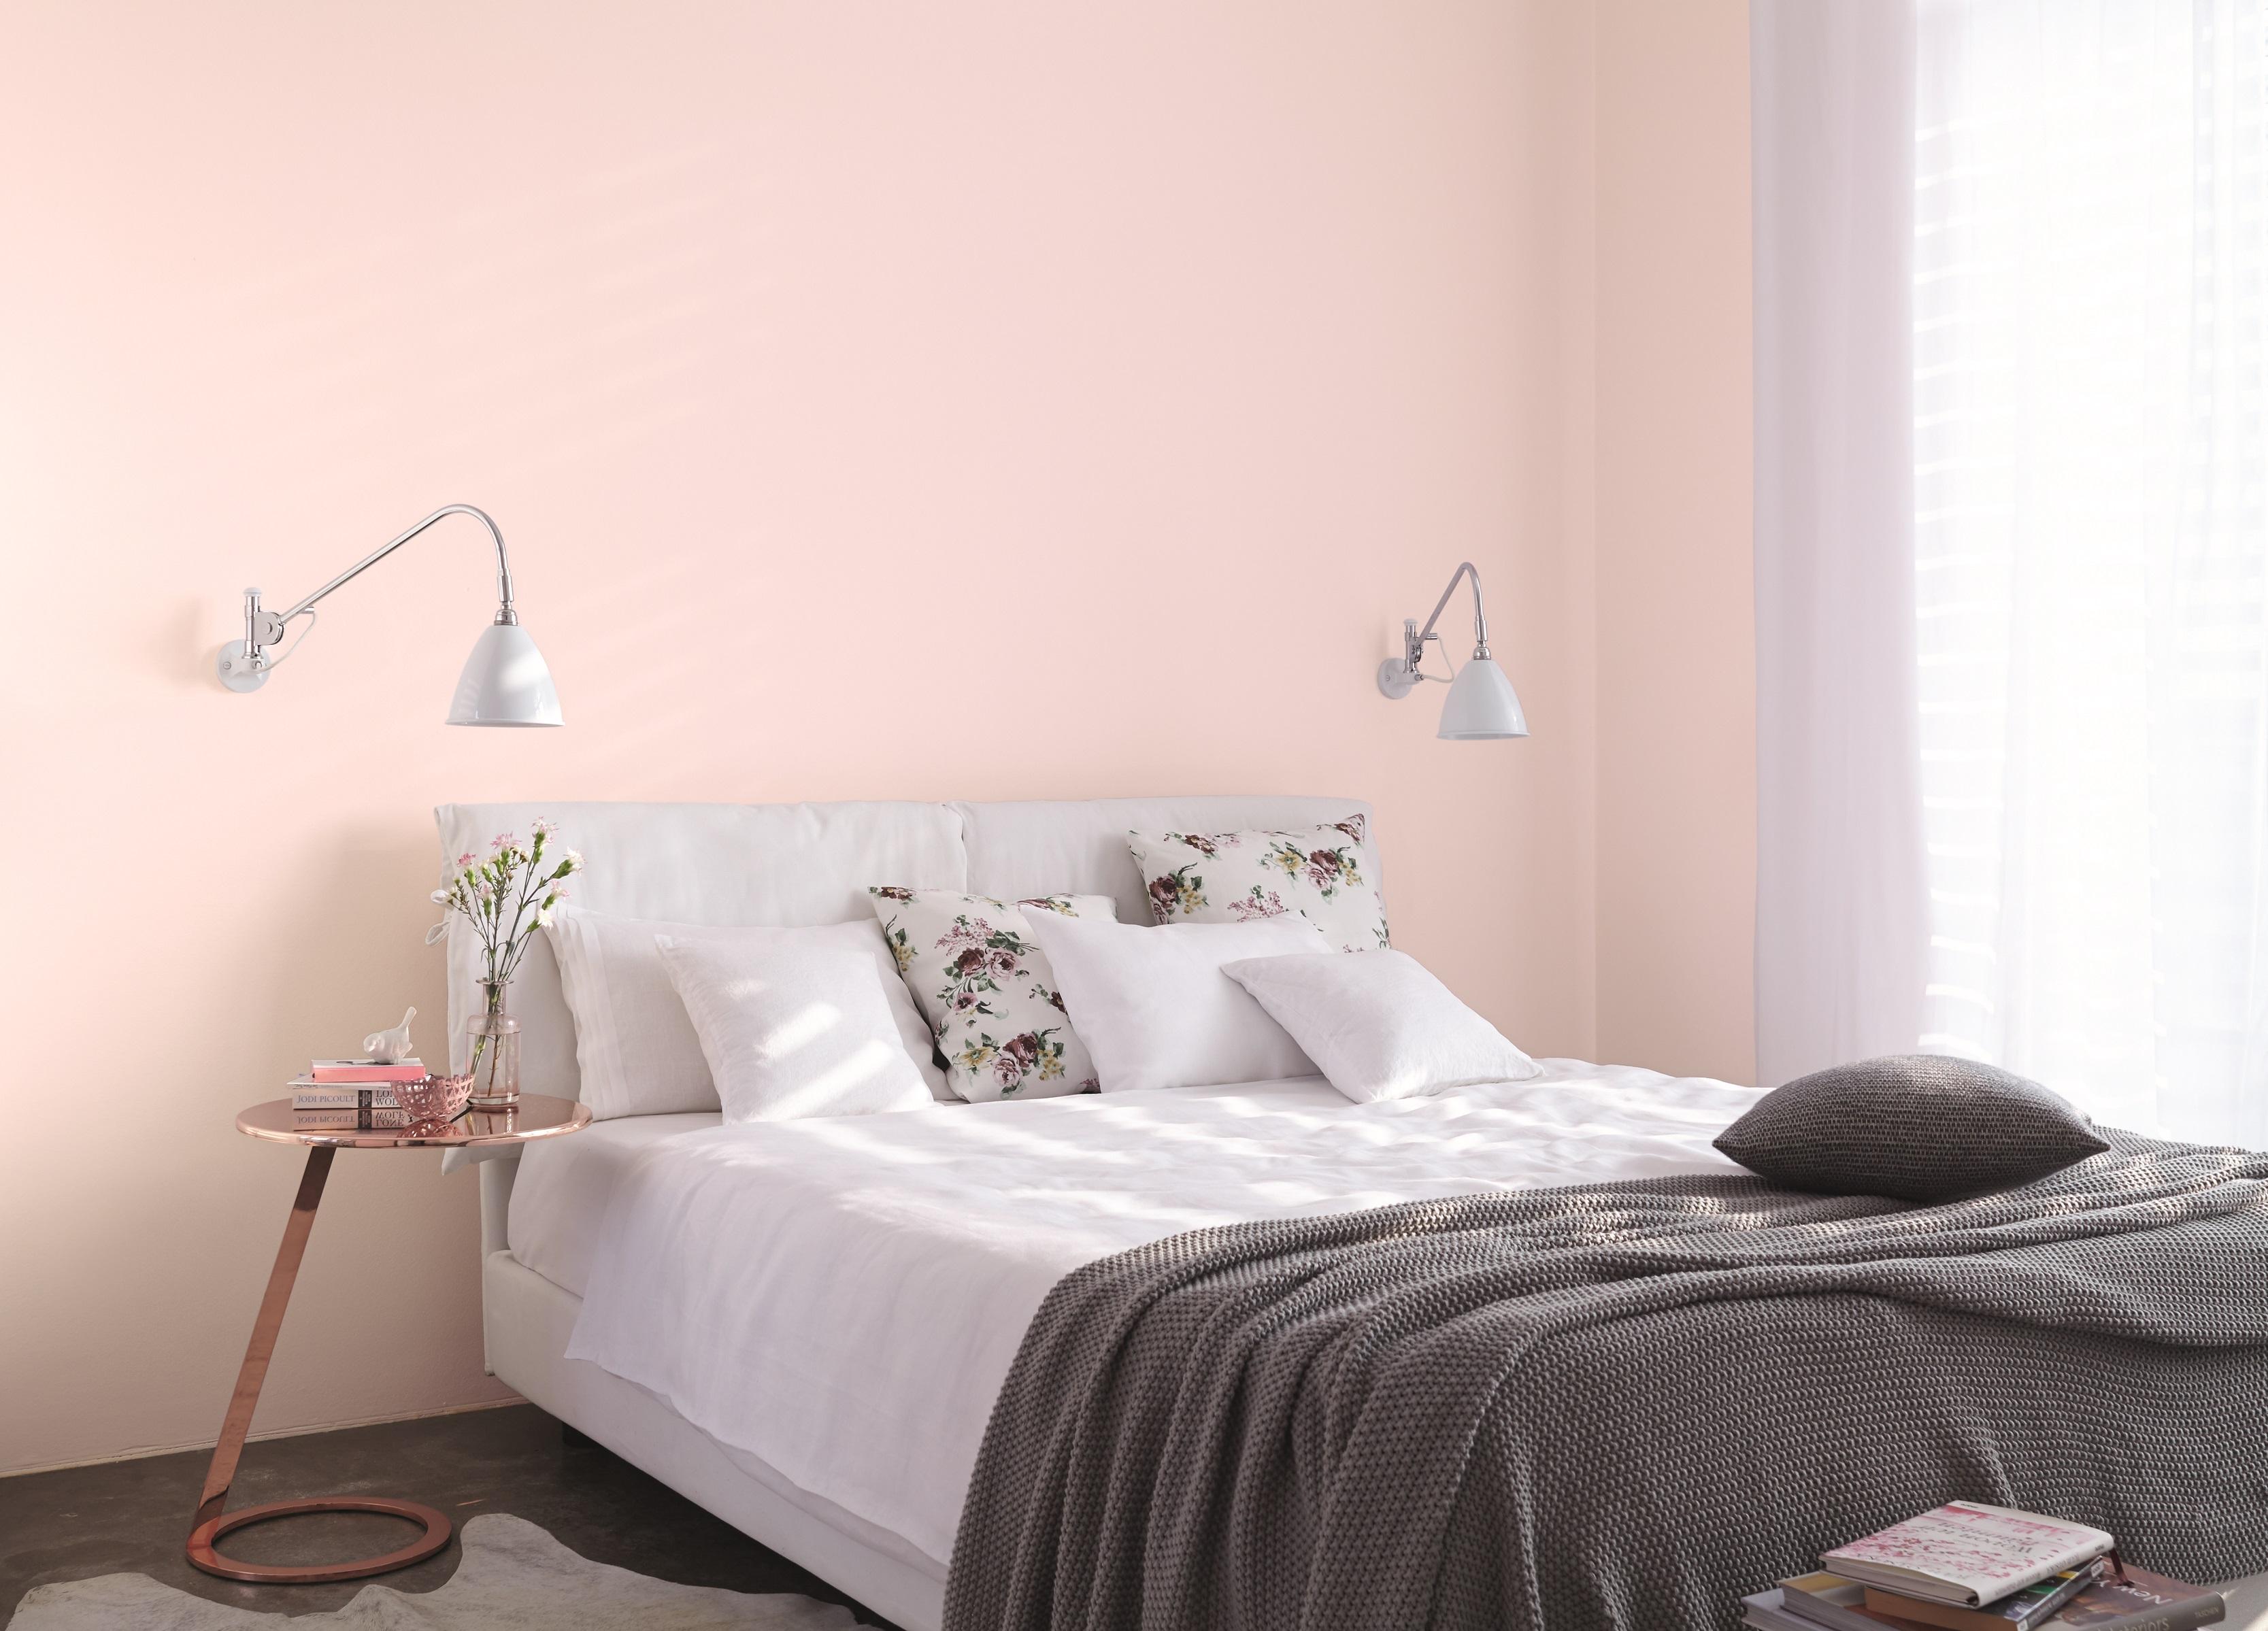 Wunderbar Rosé Wandfarbe Im Schlafzimmer